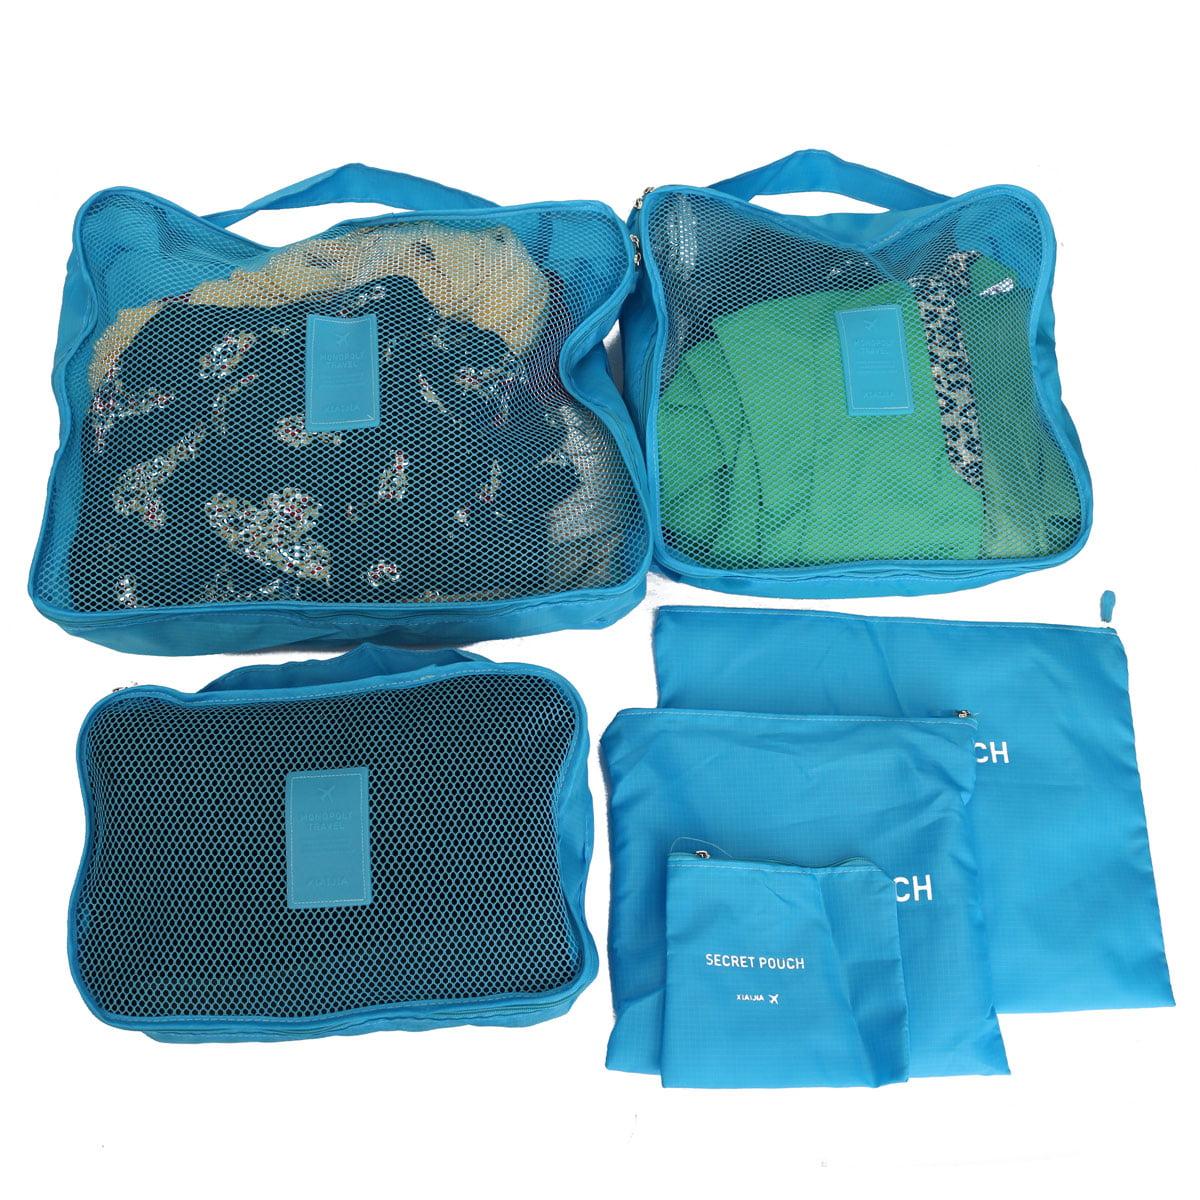 d1f1b4861066 Meigar 6Pcs Waterproof Clothes Storage Bags Travel Luggage Organizer ...